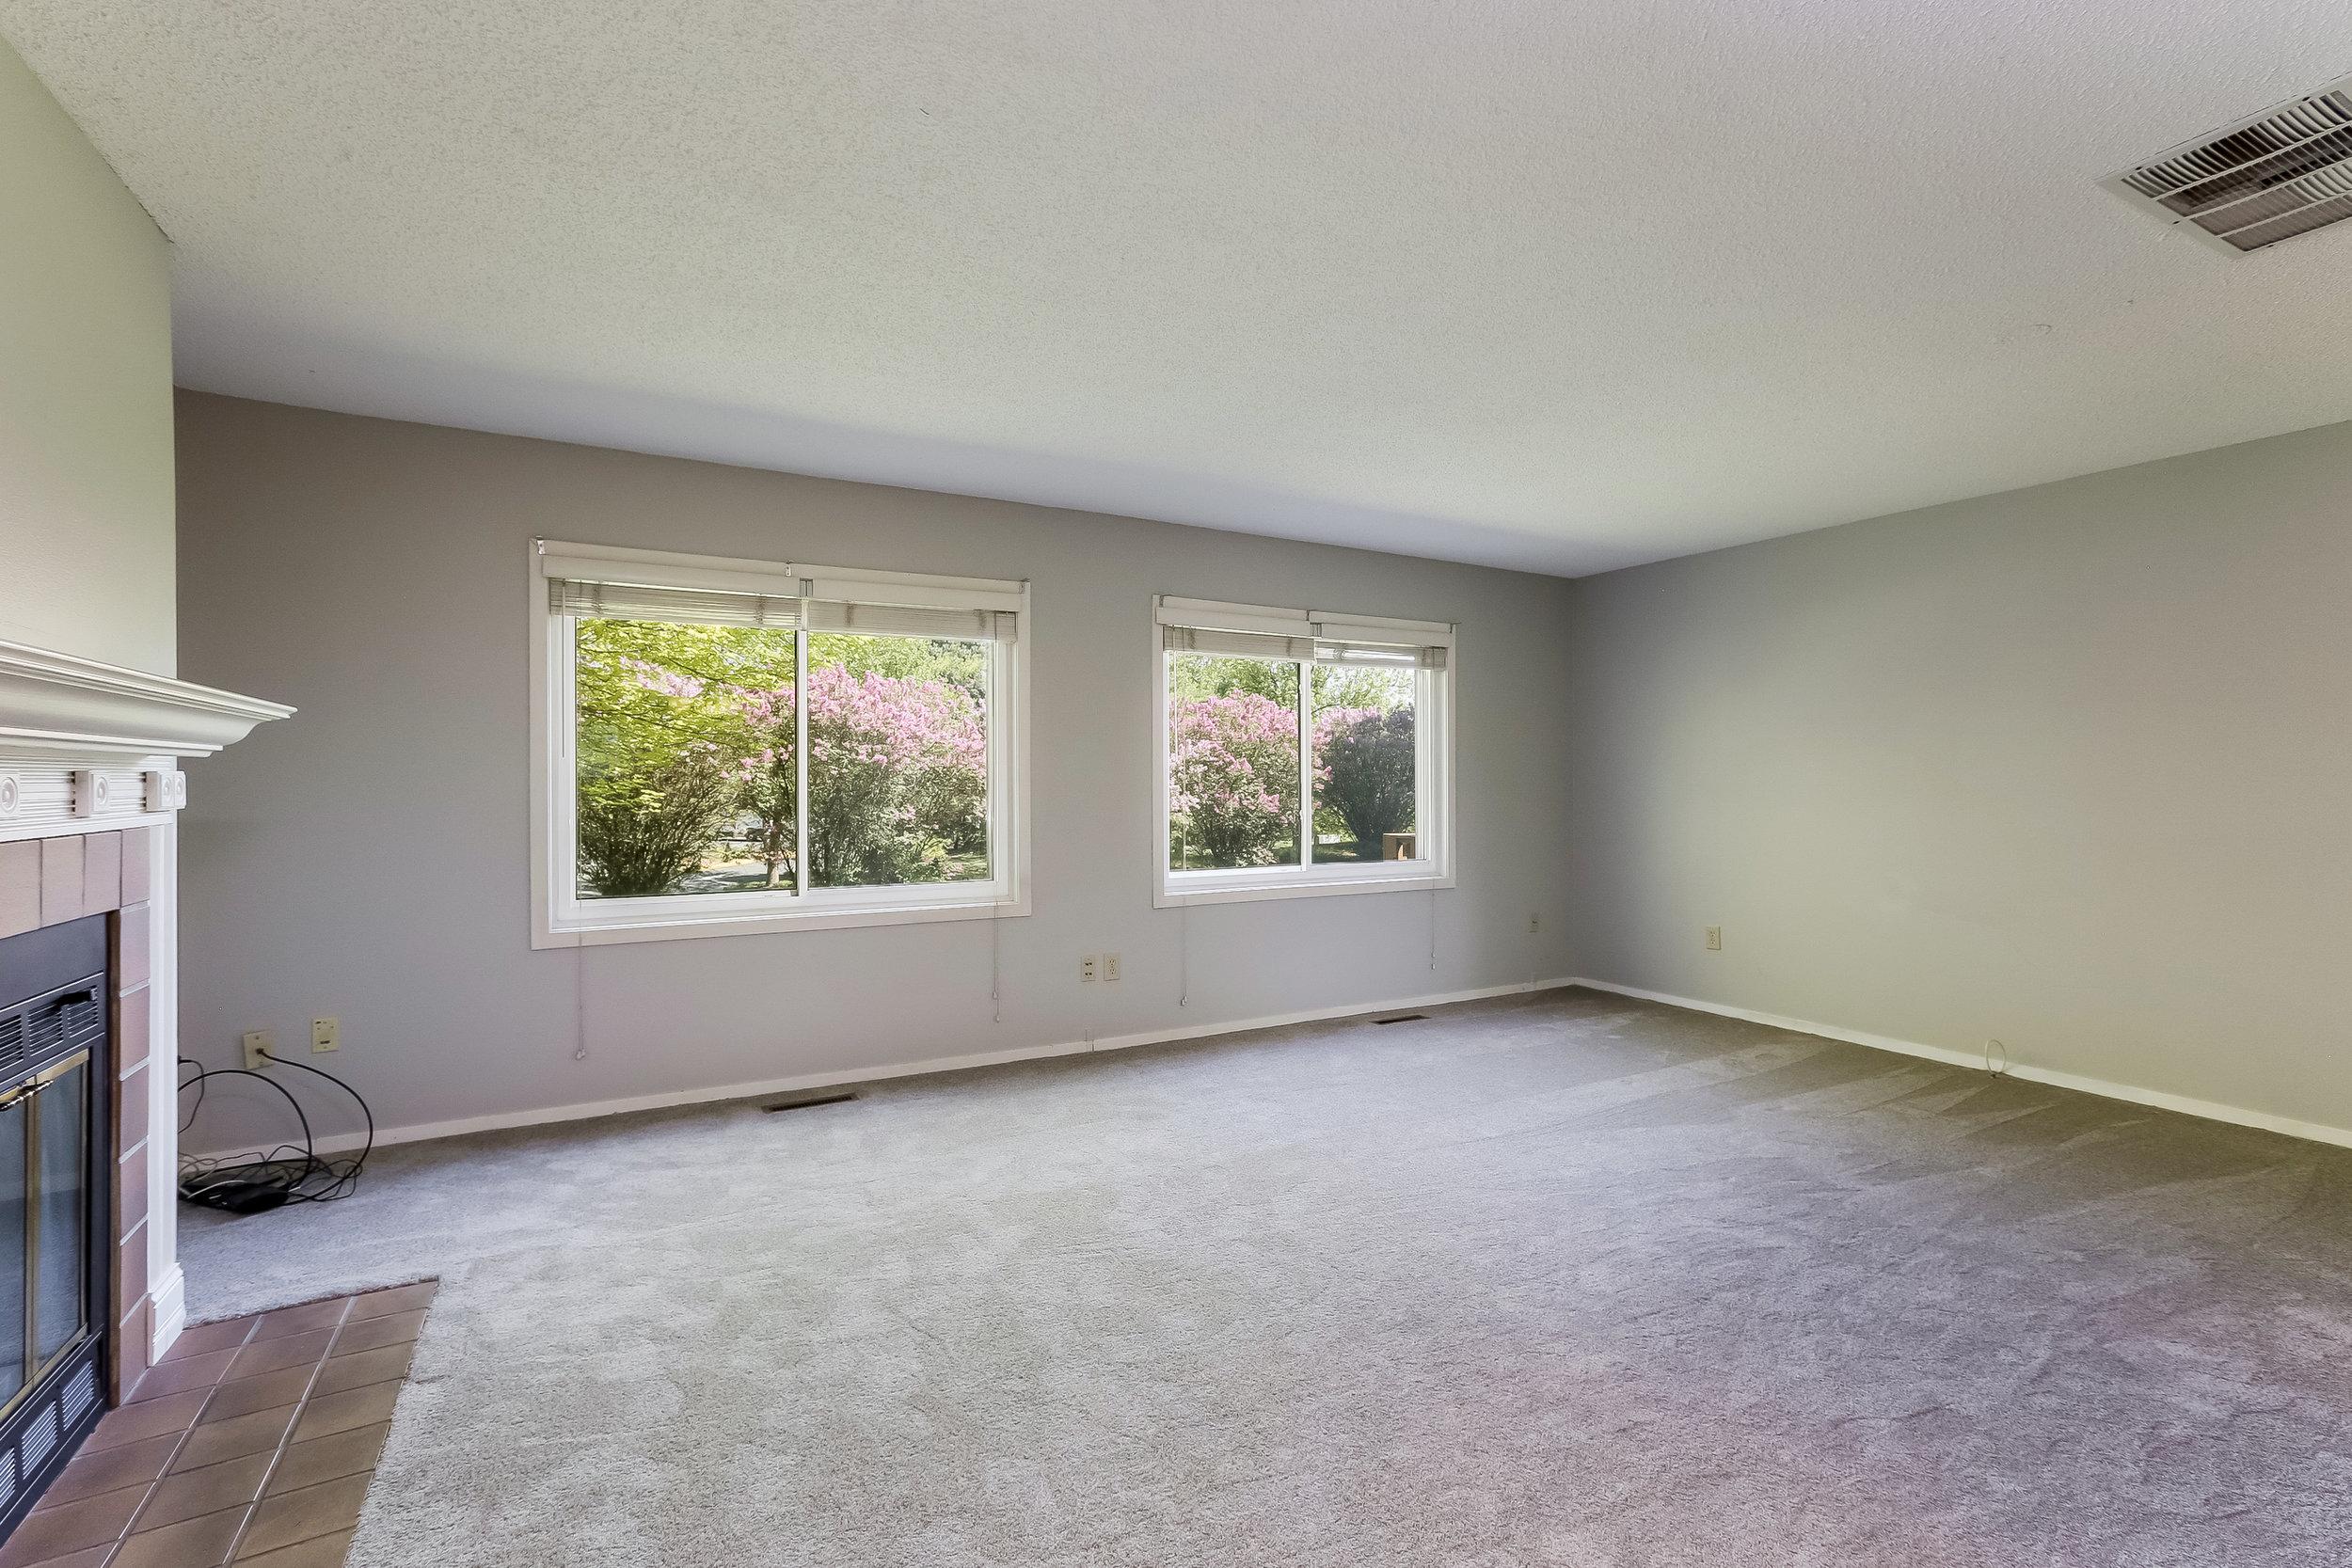 006-Living_Room-5747628-large.jpg